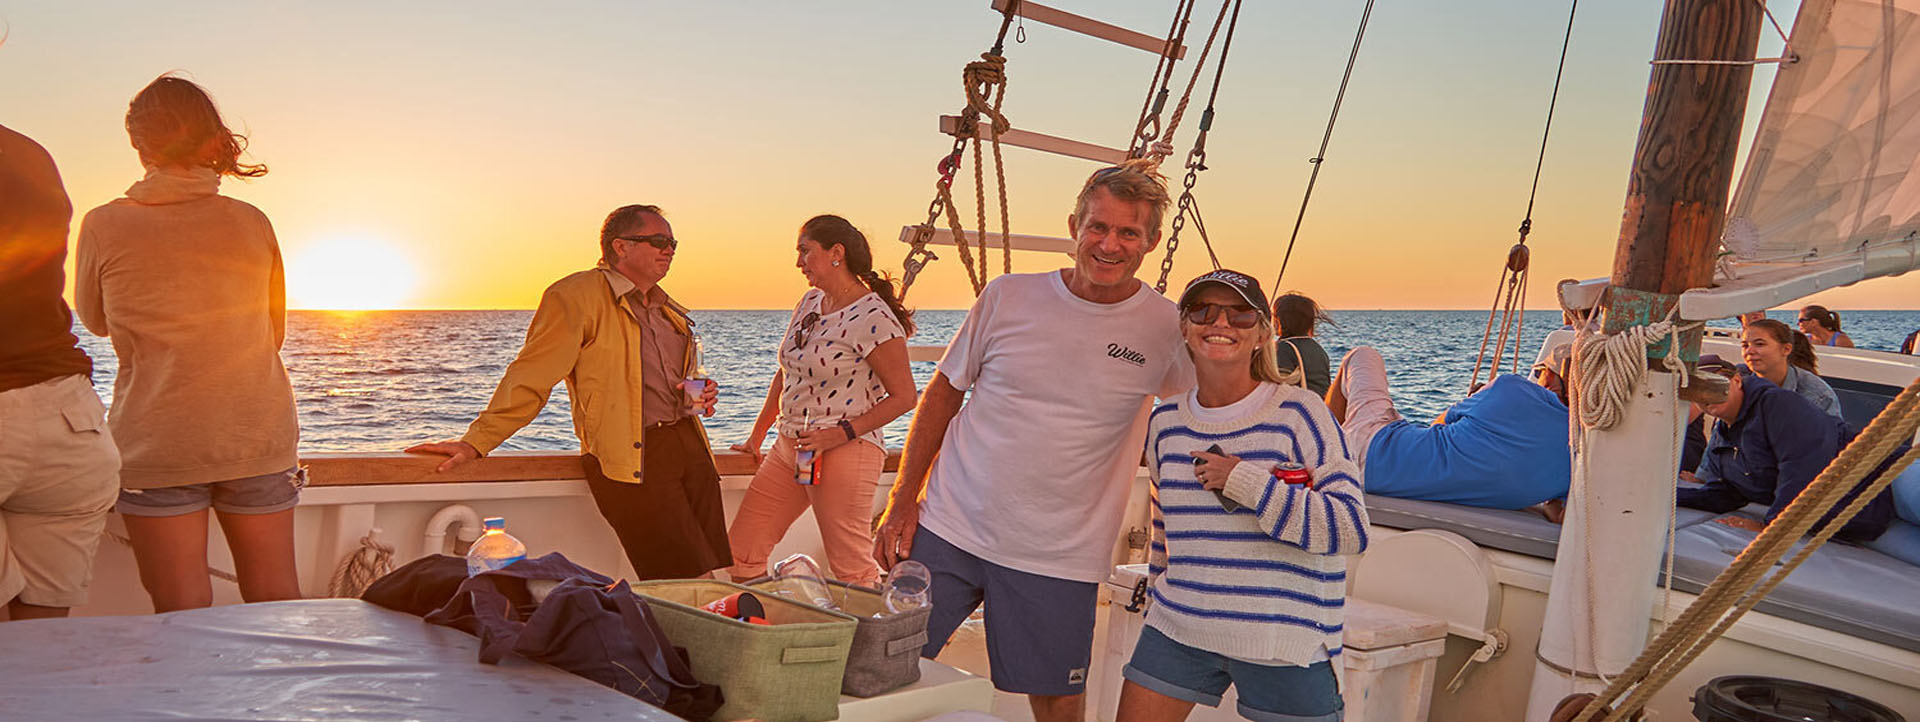 DUNSBOROUGH lugger cruises sunset ocean